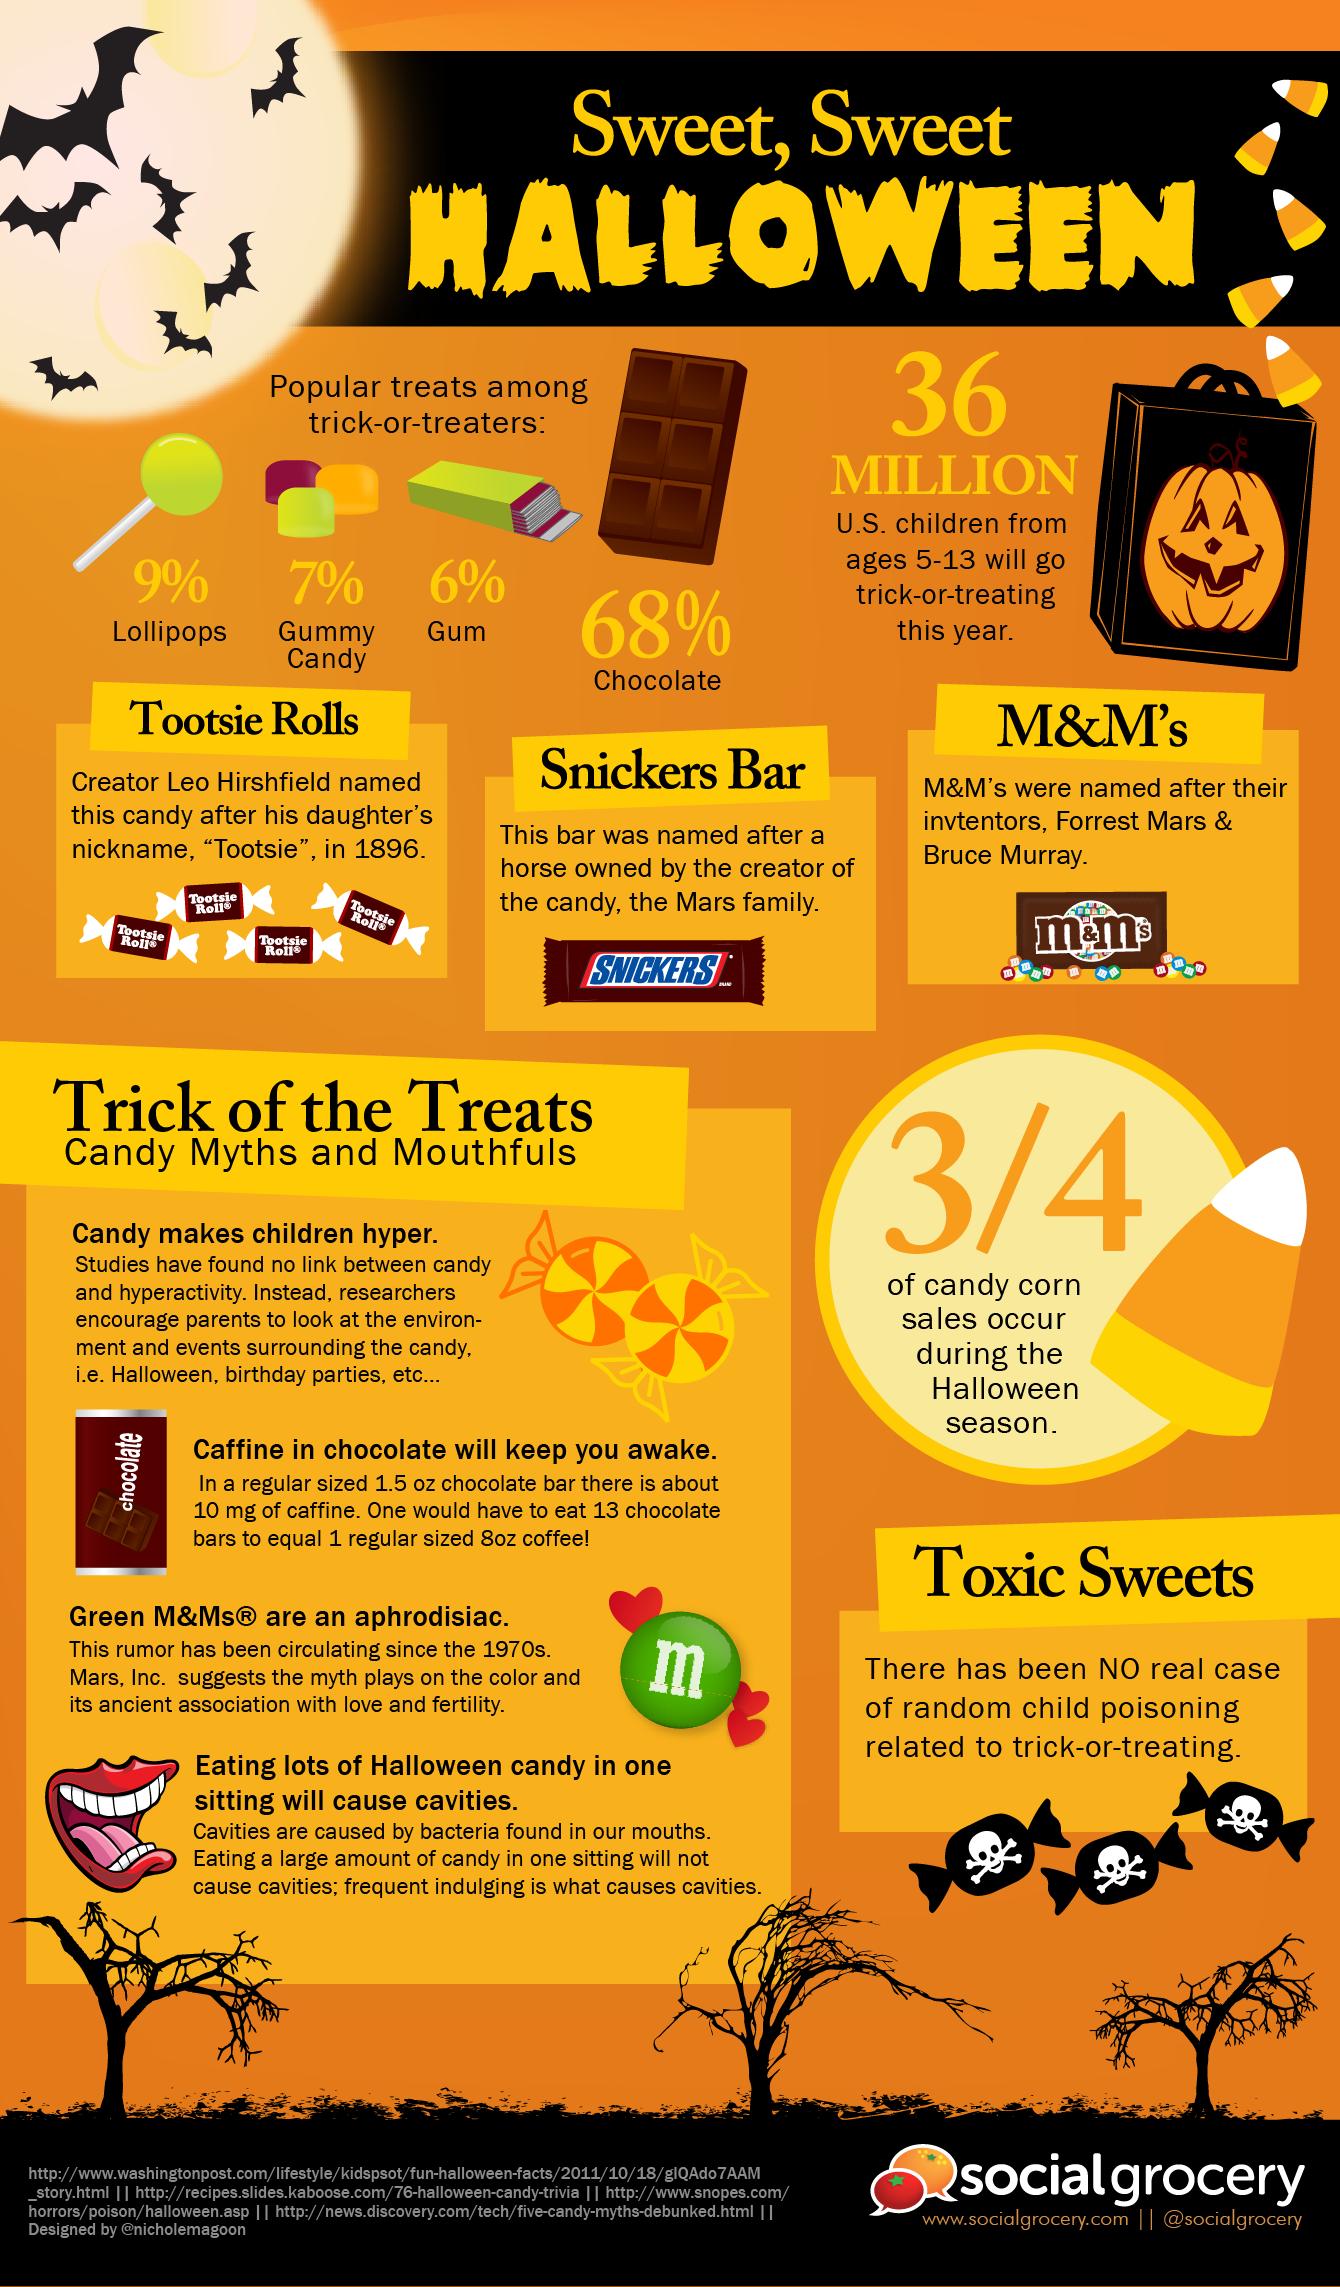 Halloween Infographic - Sweet, Sweet Halloween